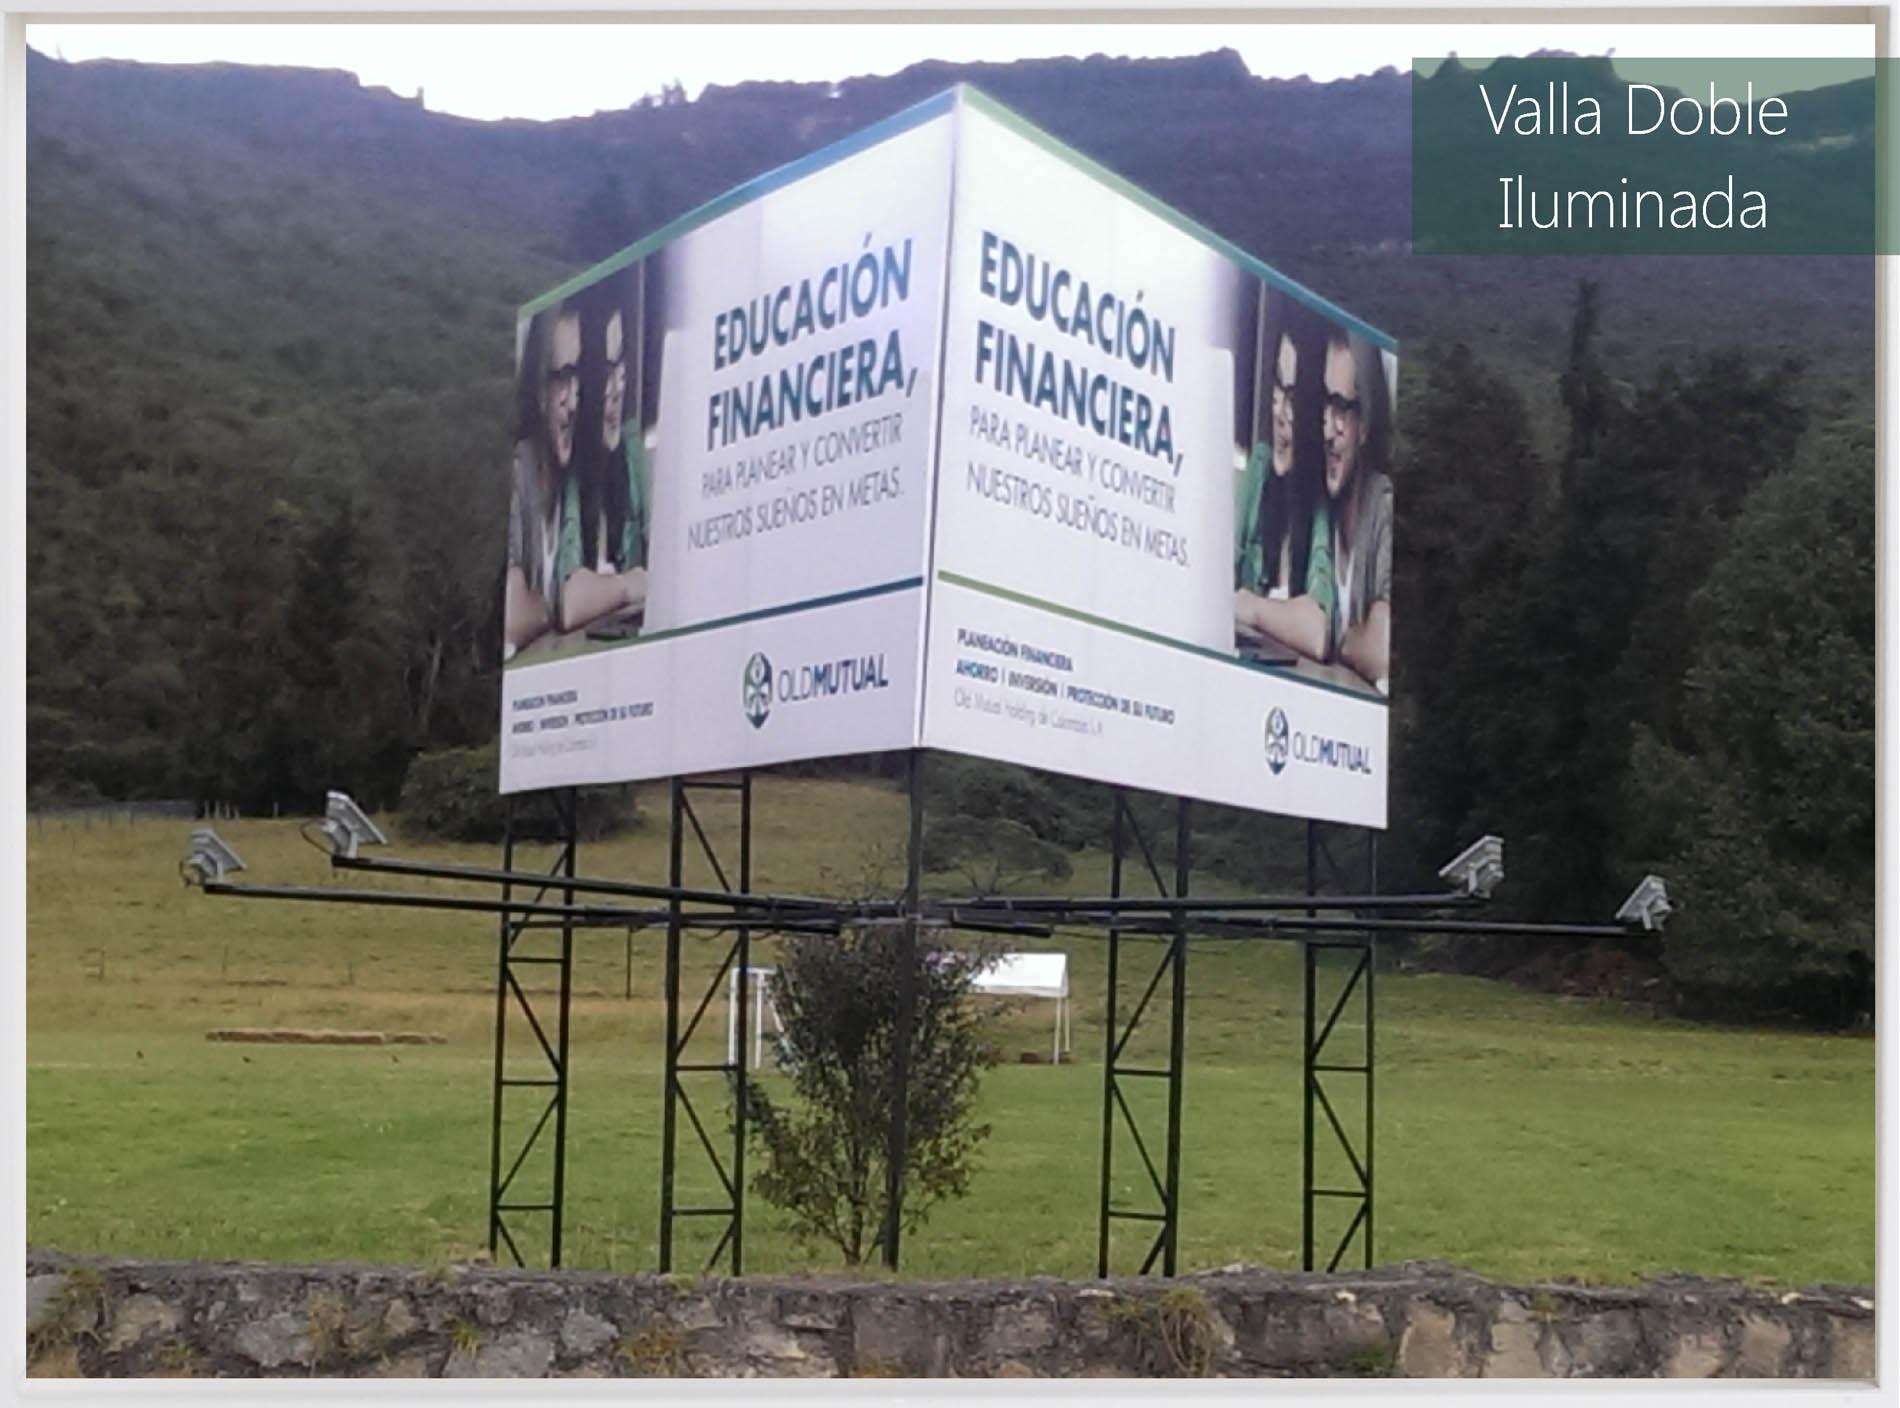 48_valla_doble_cerchas_iluminada_reflectores_ggcm